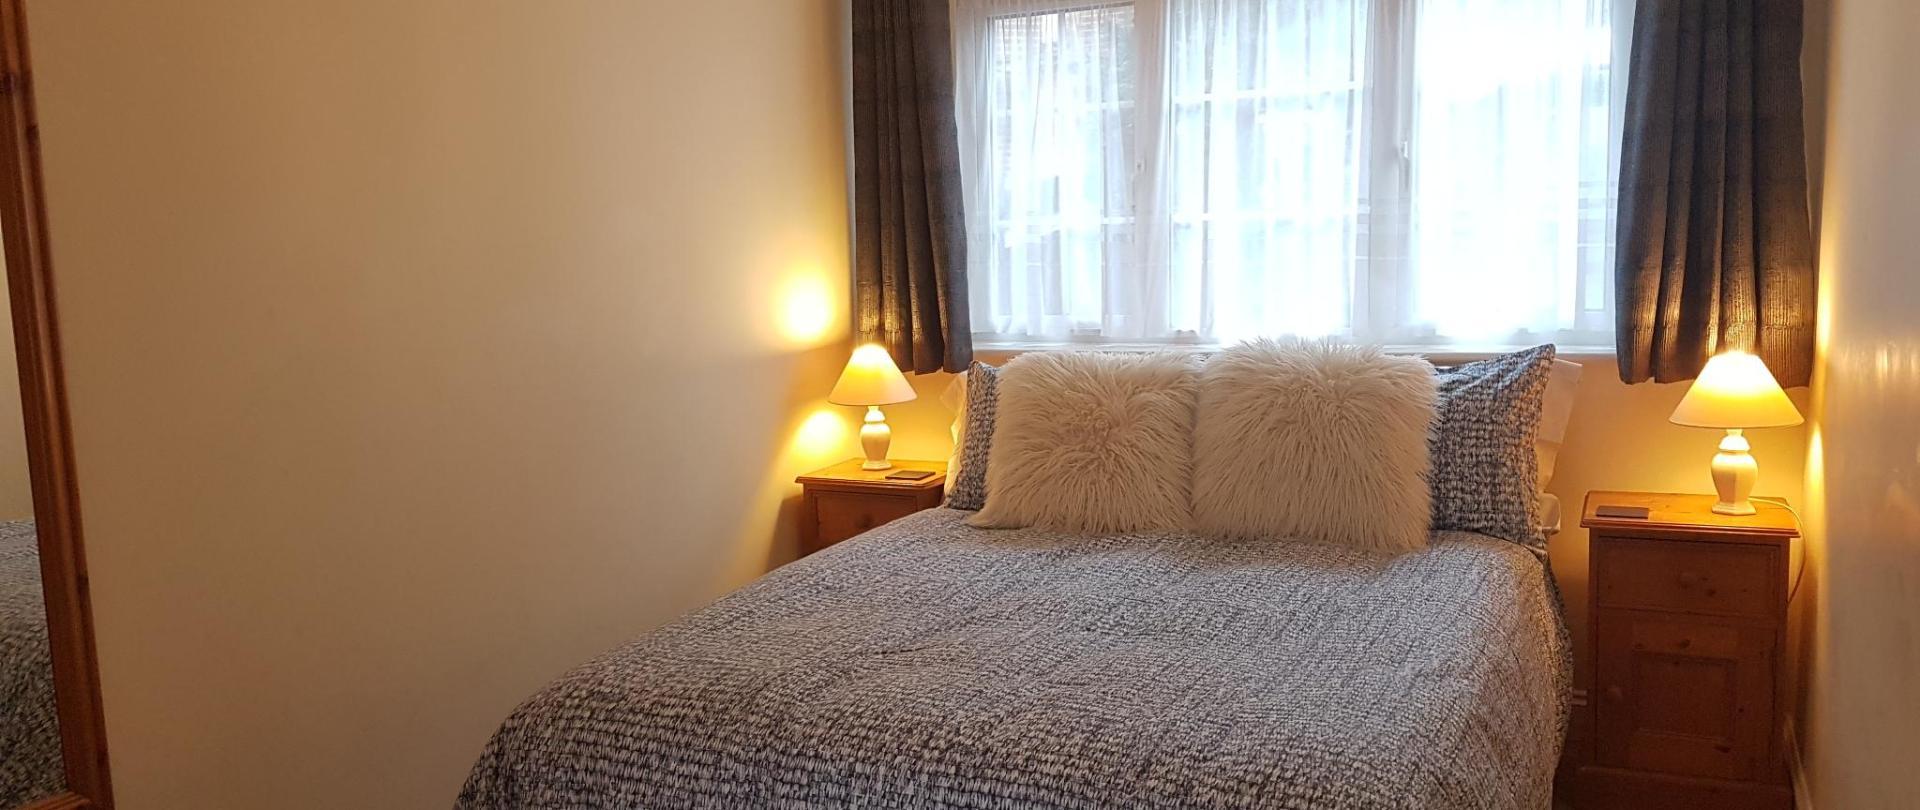 Chalet Bedroom 251118.jpg